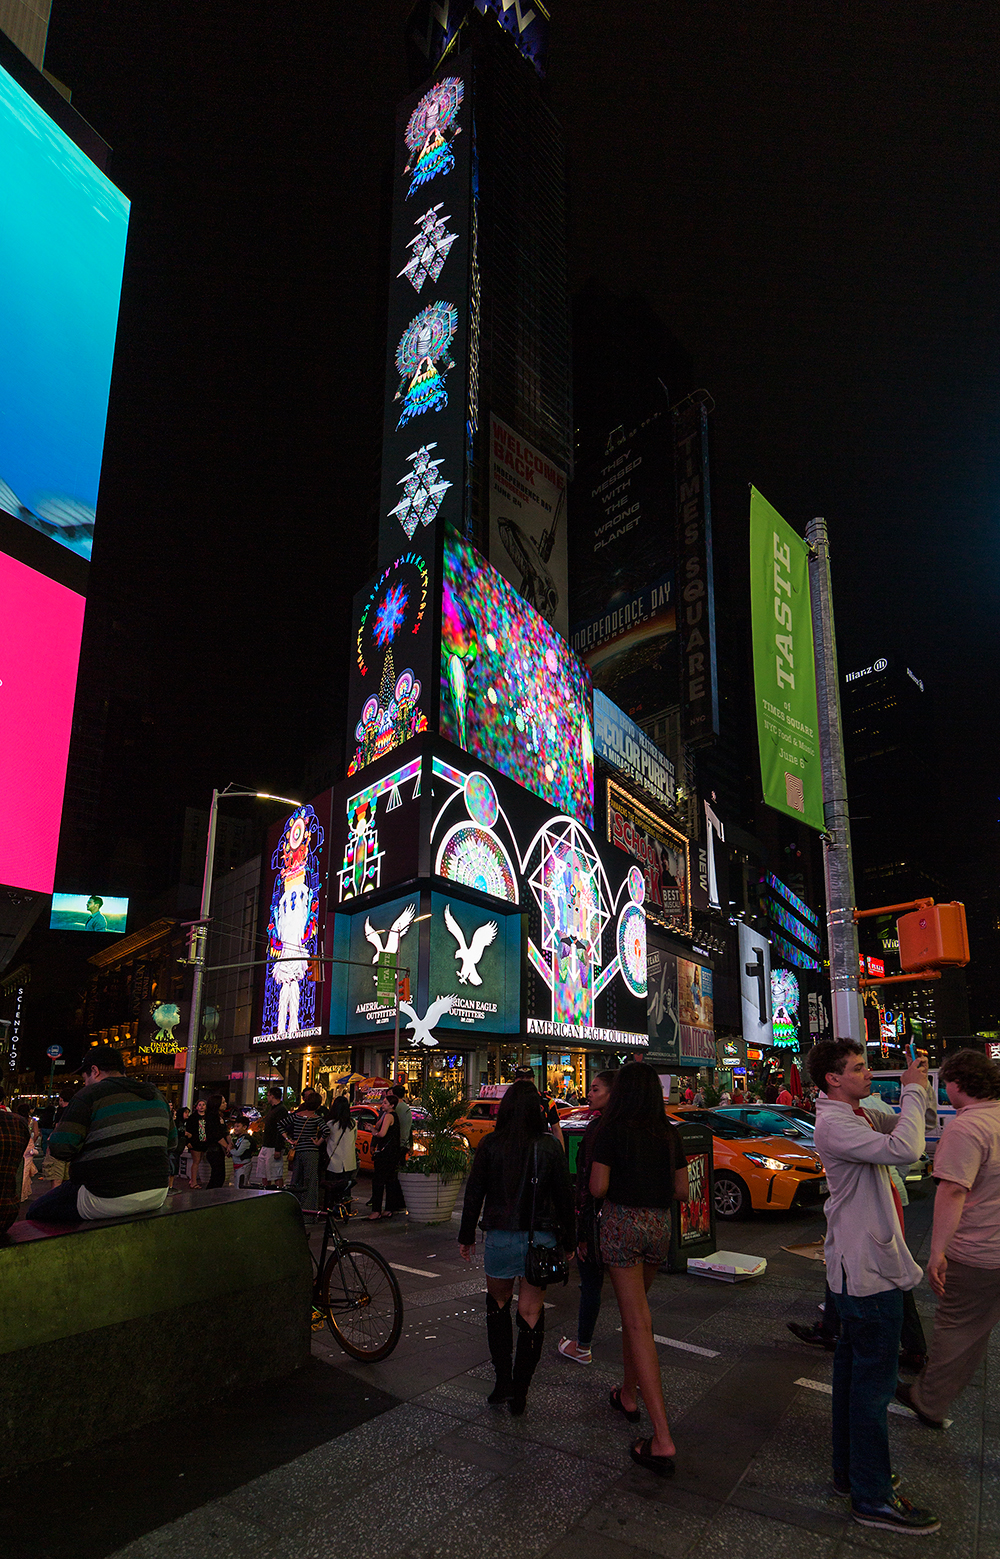 ChimaCloud   Video Midnight Moment Time Square Photo Credit: Ka-Man Tse for @TSqArts 2016